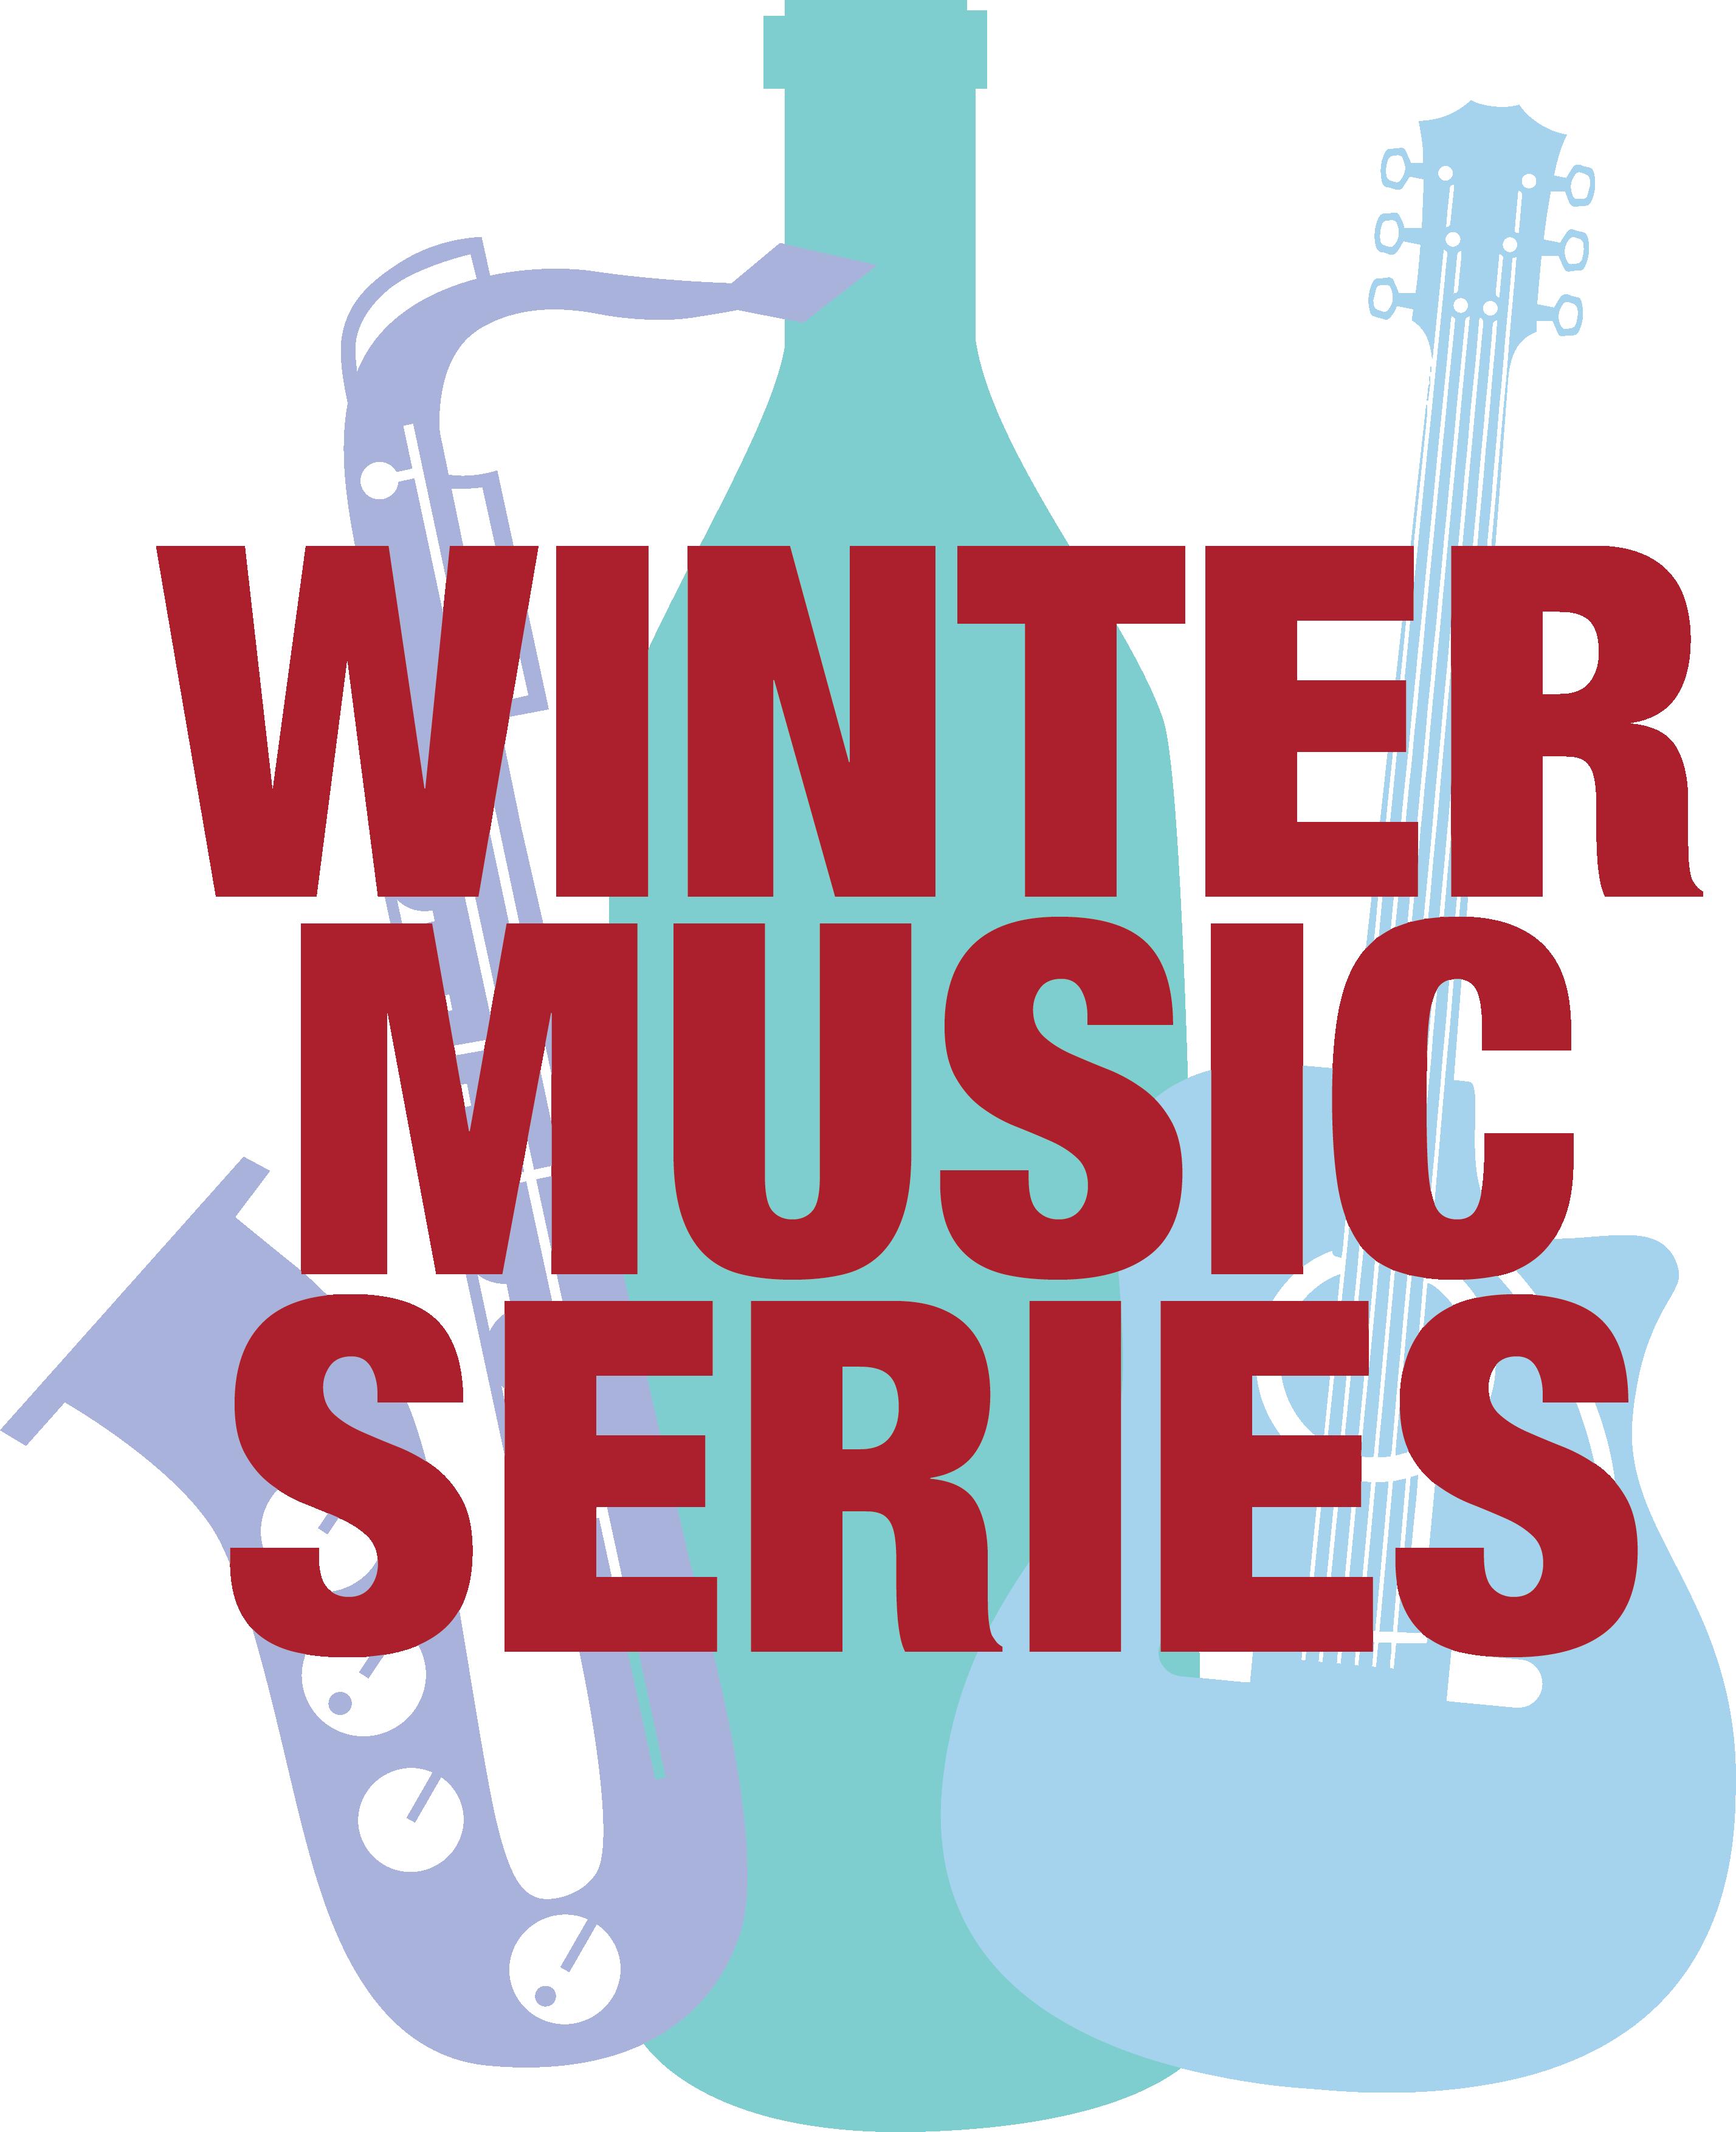 Winter music series at. Florida clipart postcard